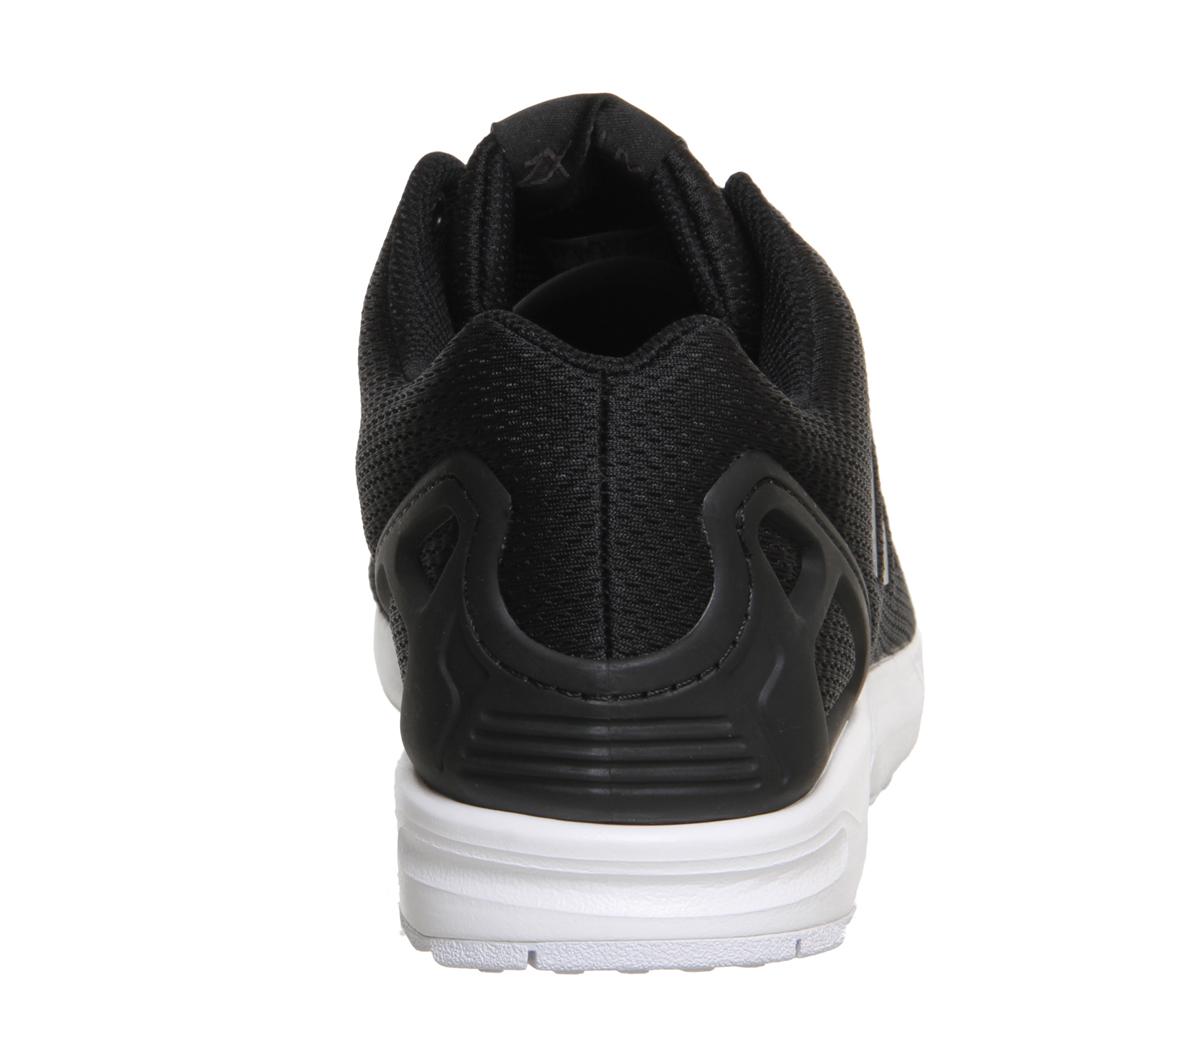 various colors 4c0dd 9bccf Sentinel Mens Adidas Zx Flux BLACK WHITE Trainers Shoes